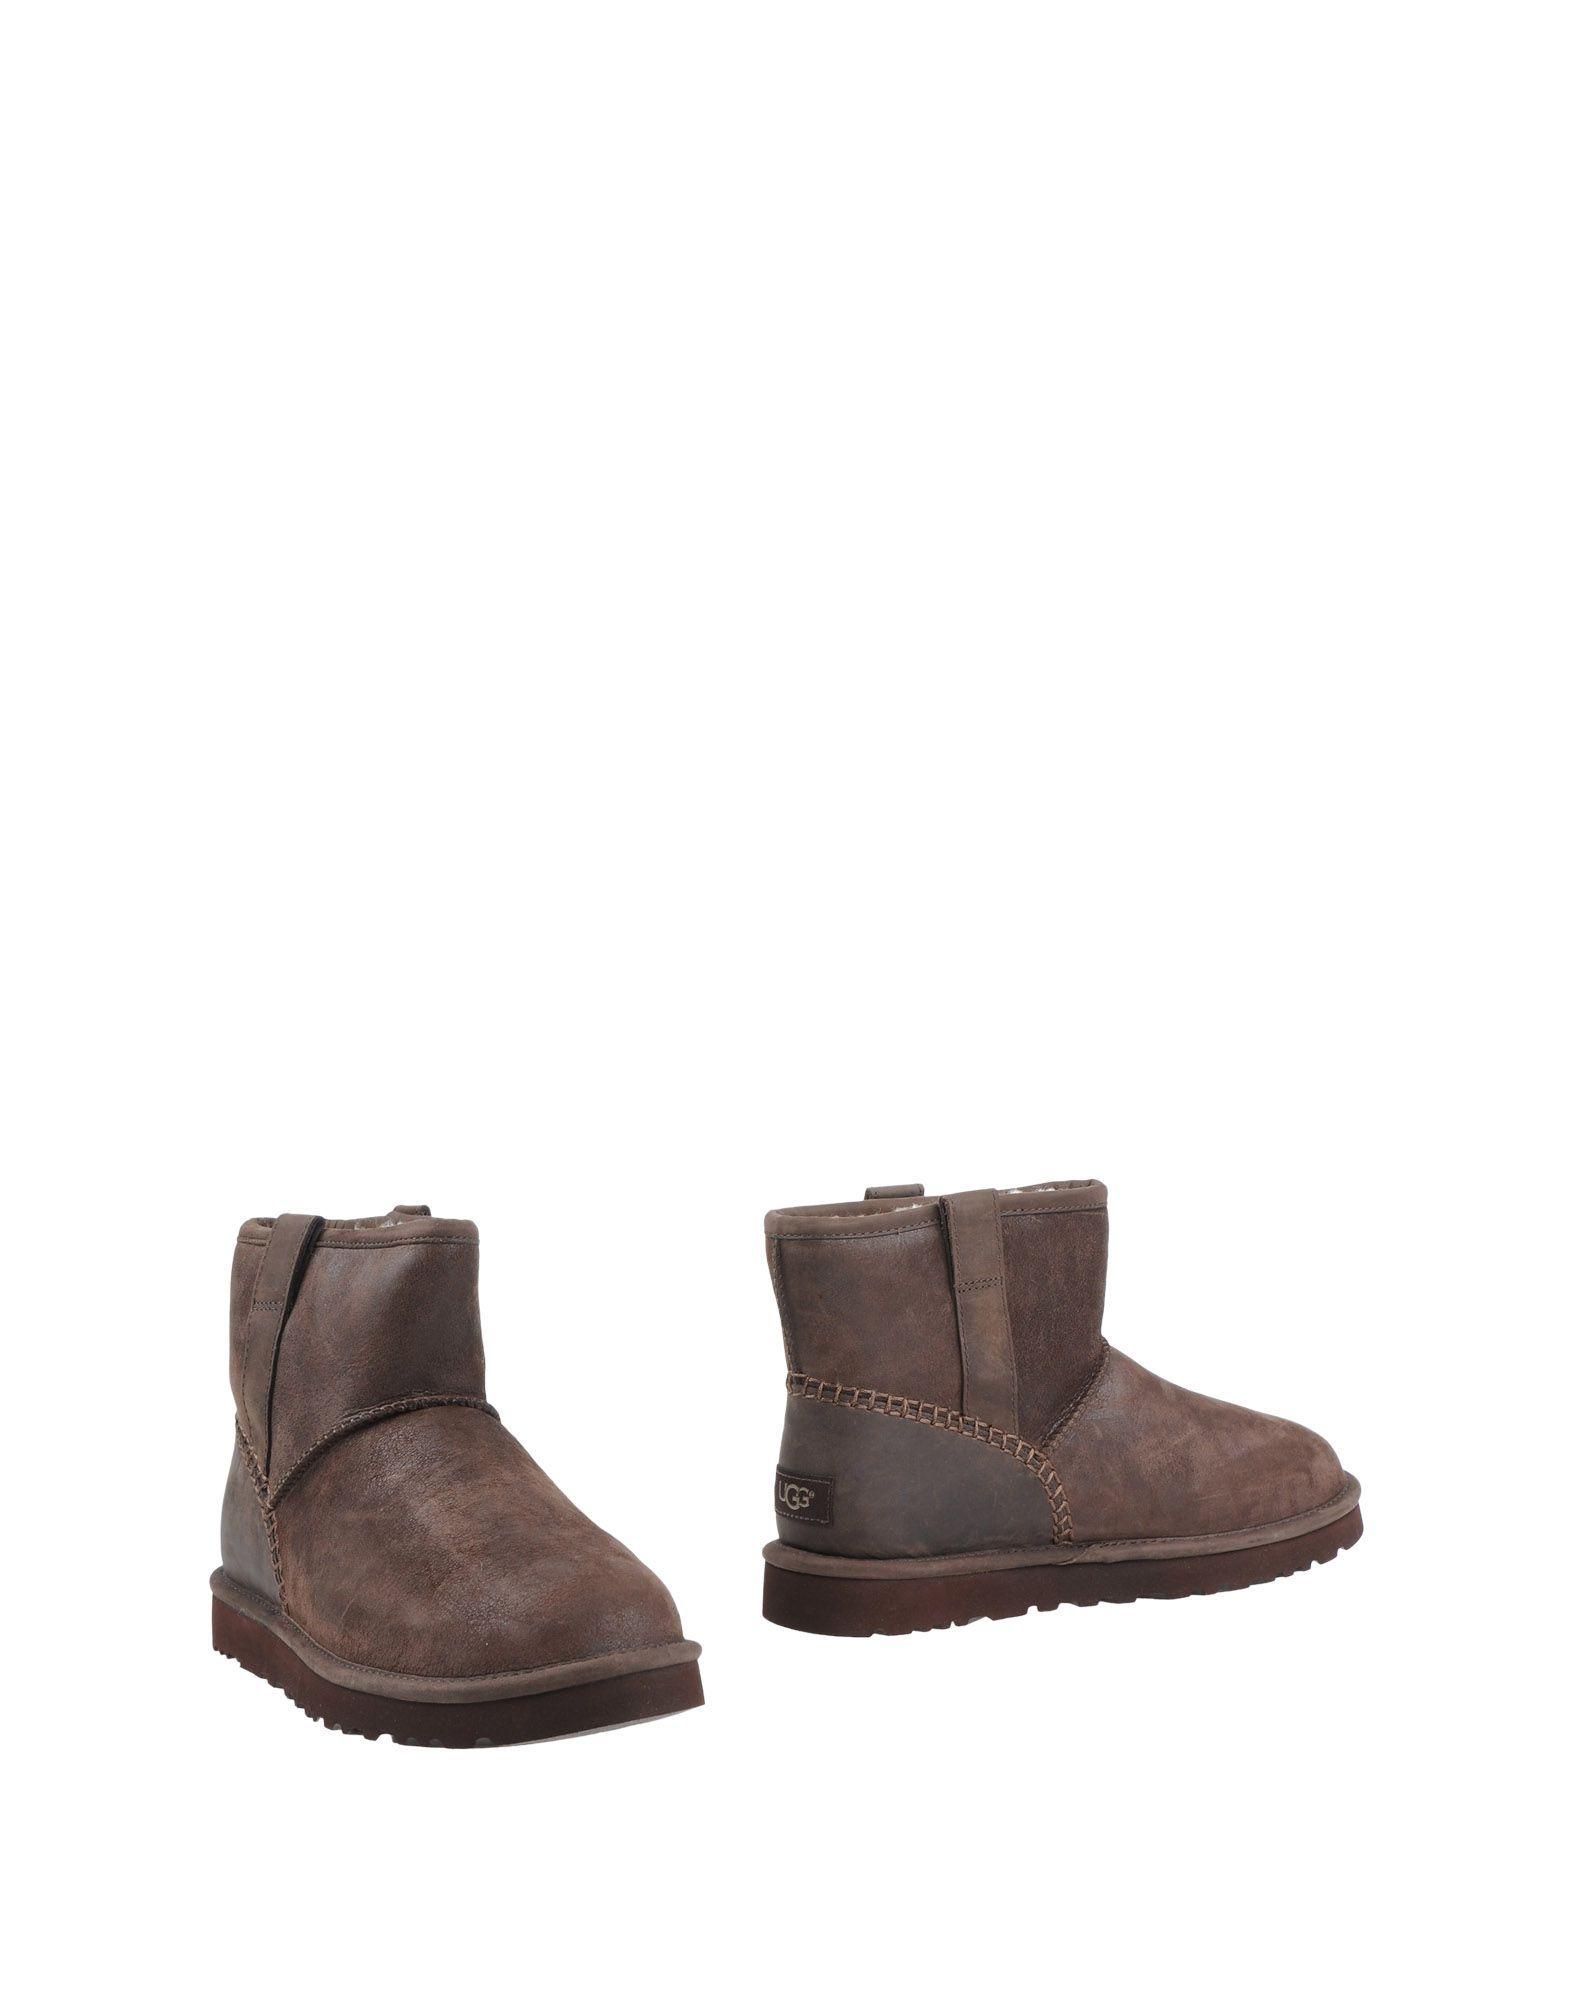 Ugg Australia Dark Brown Leather Boots